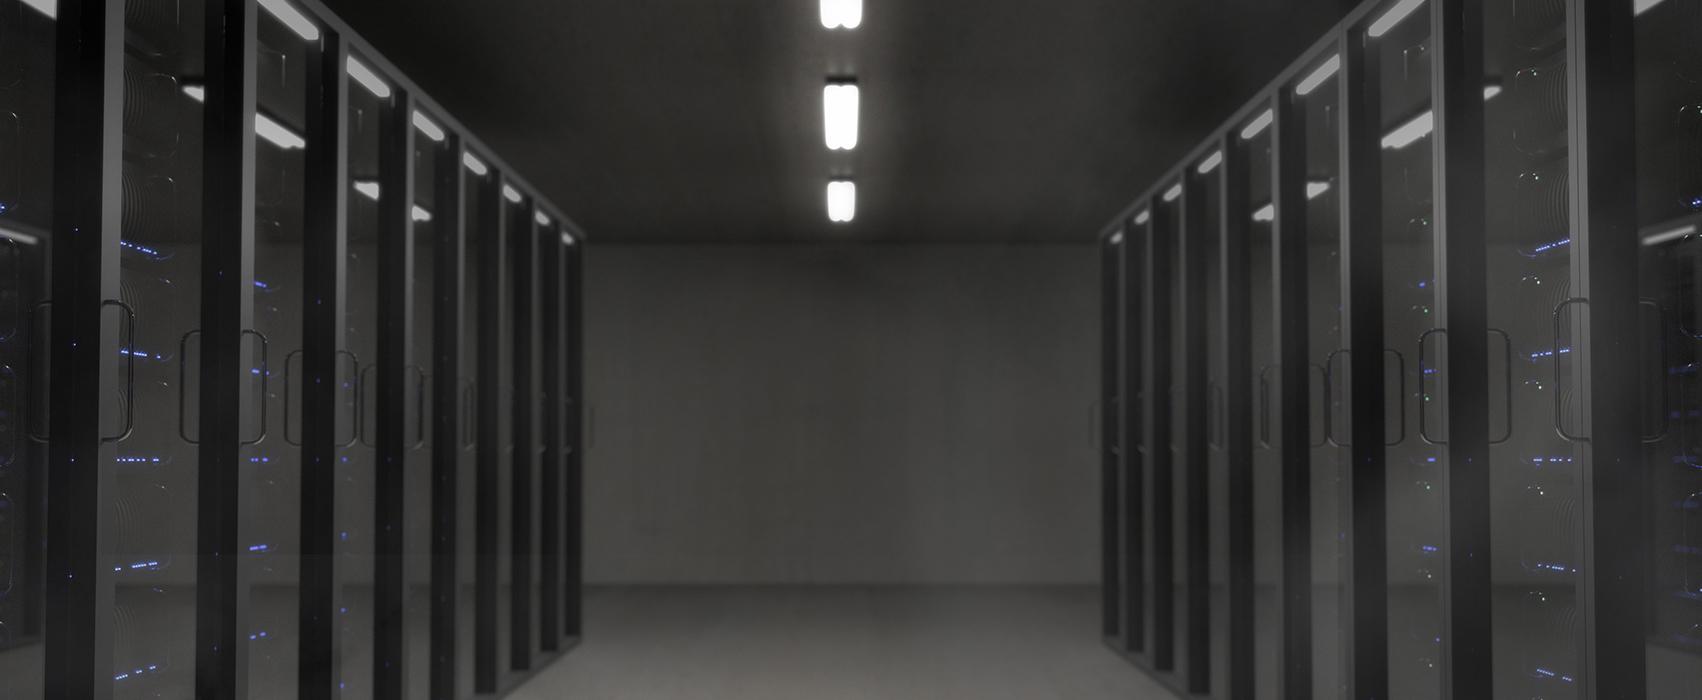 Salle de data centers - Telehouse